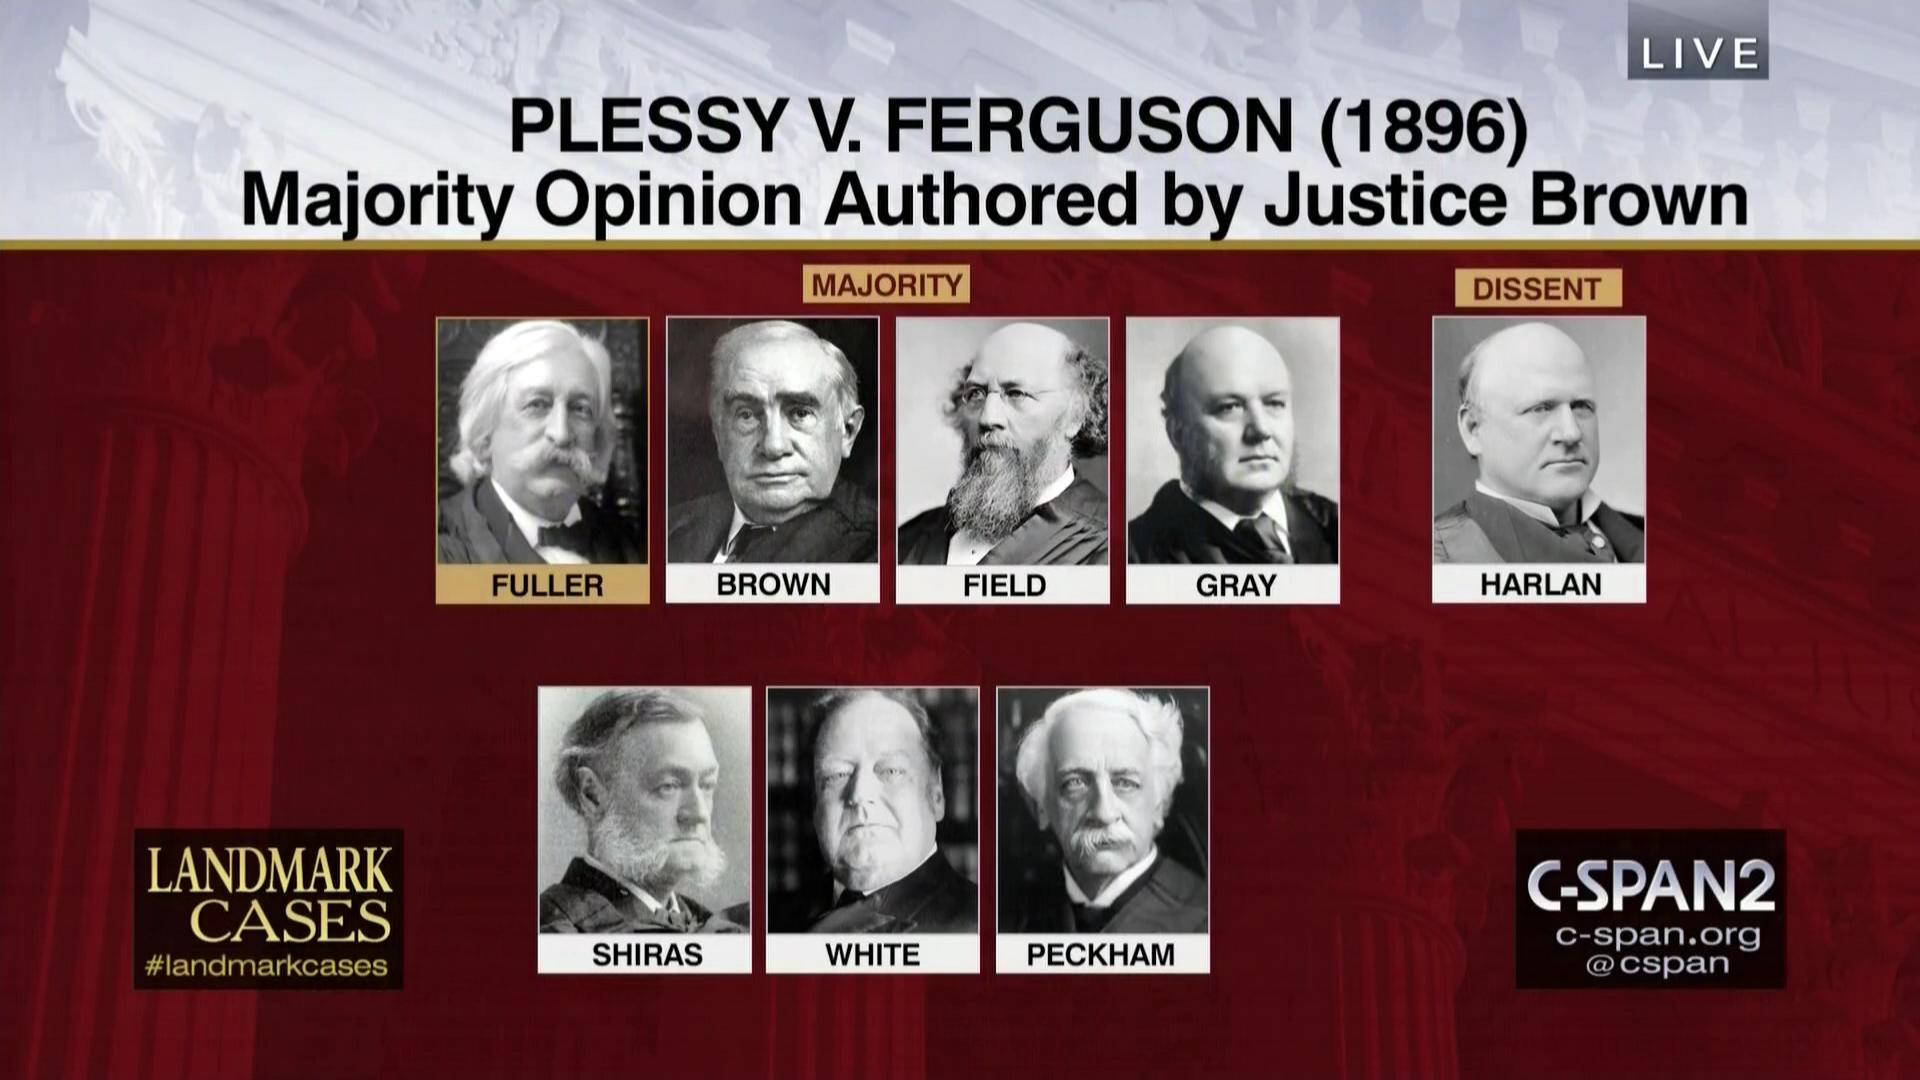 plessy vs ferguson impact